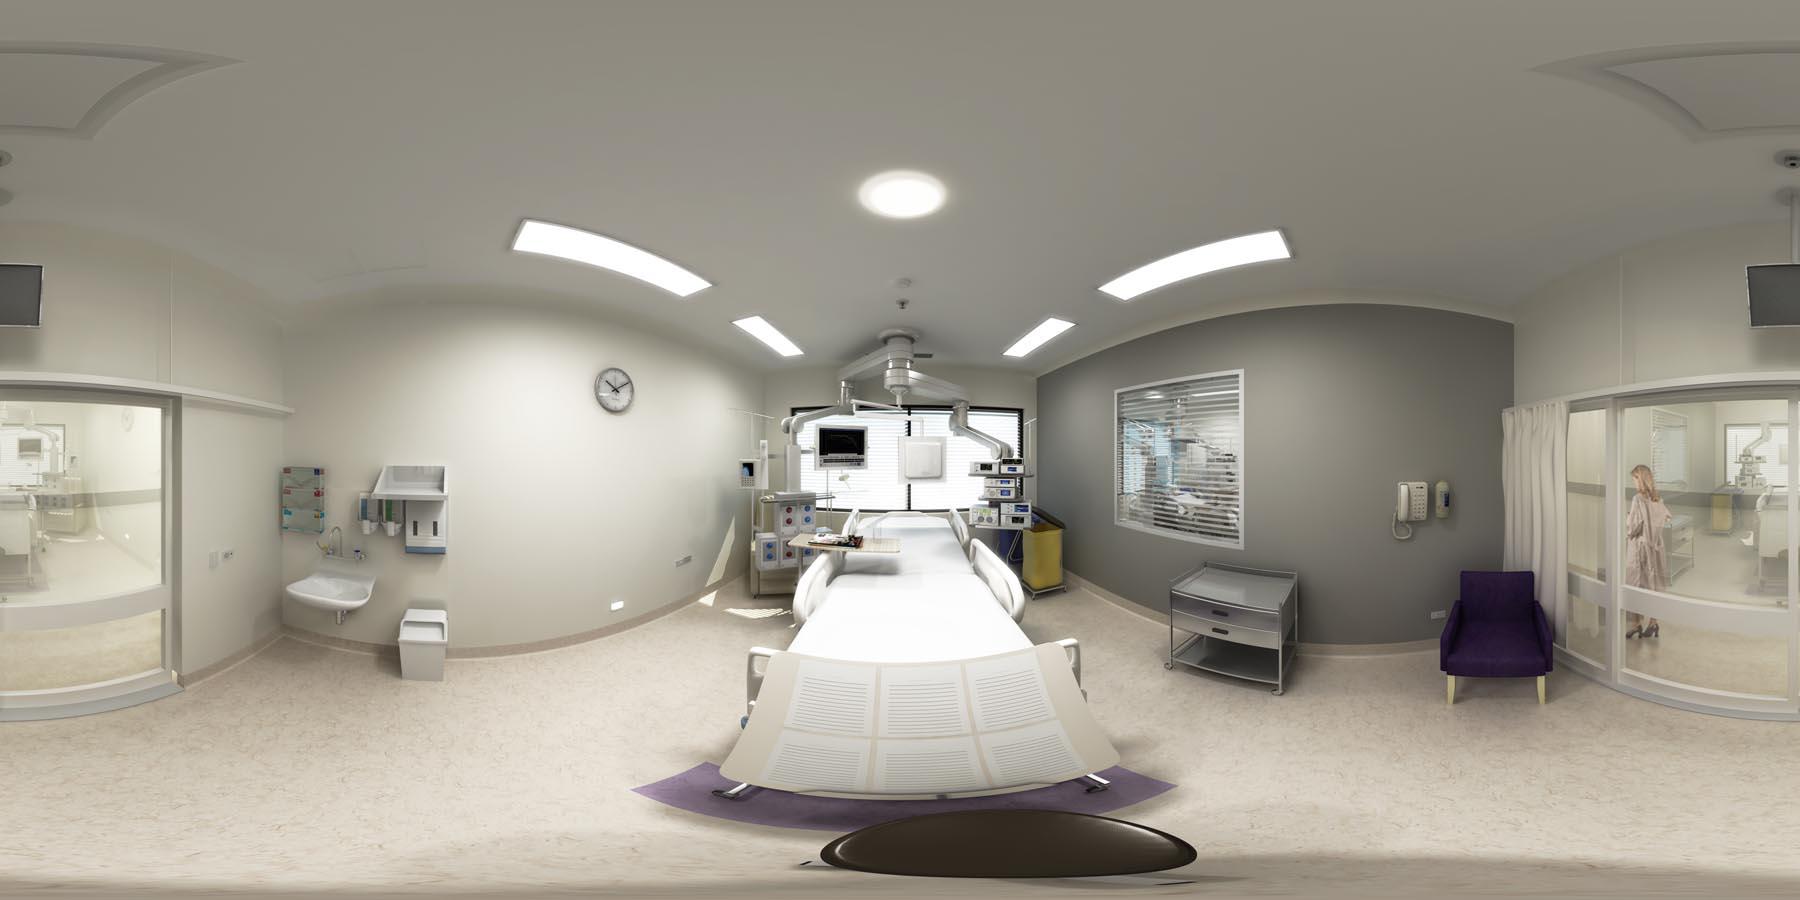 360 Virtual Reality_icu_qtvr